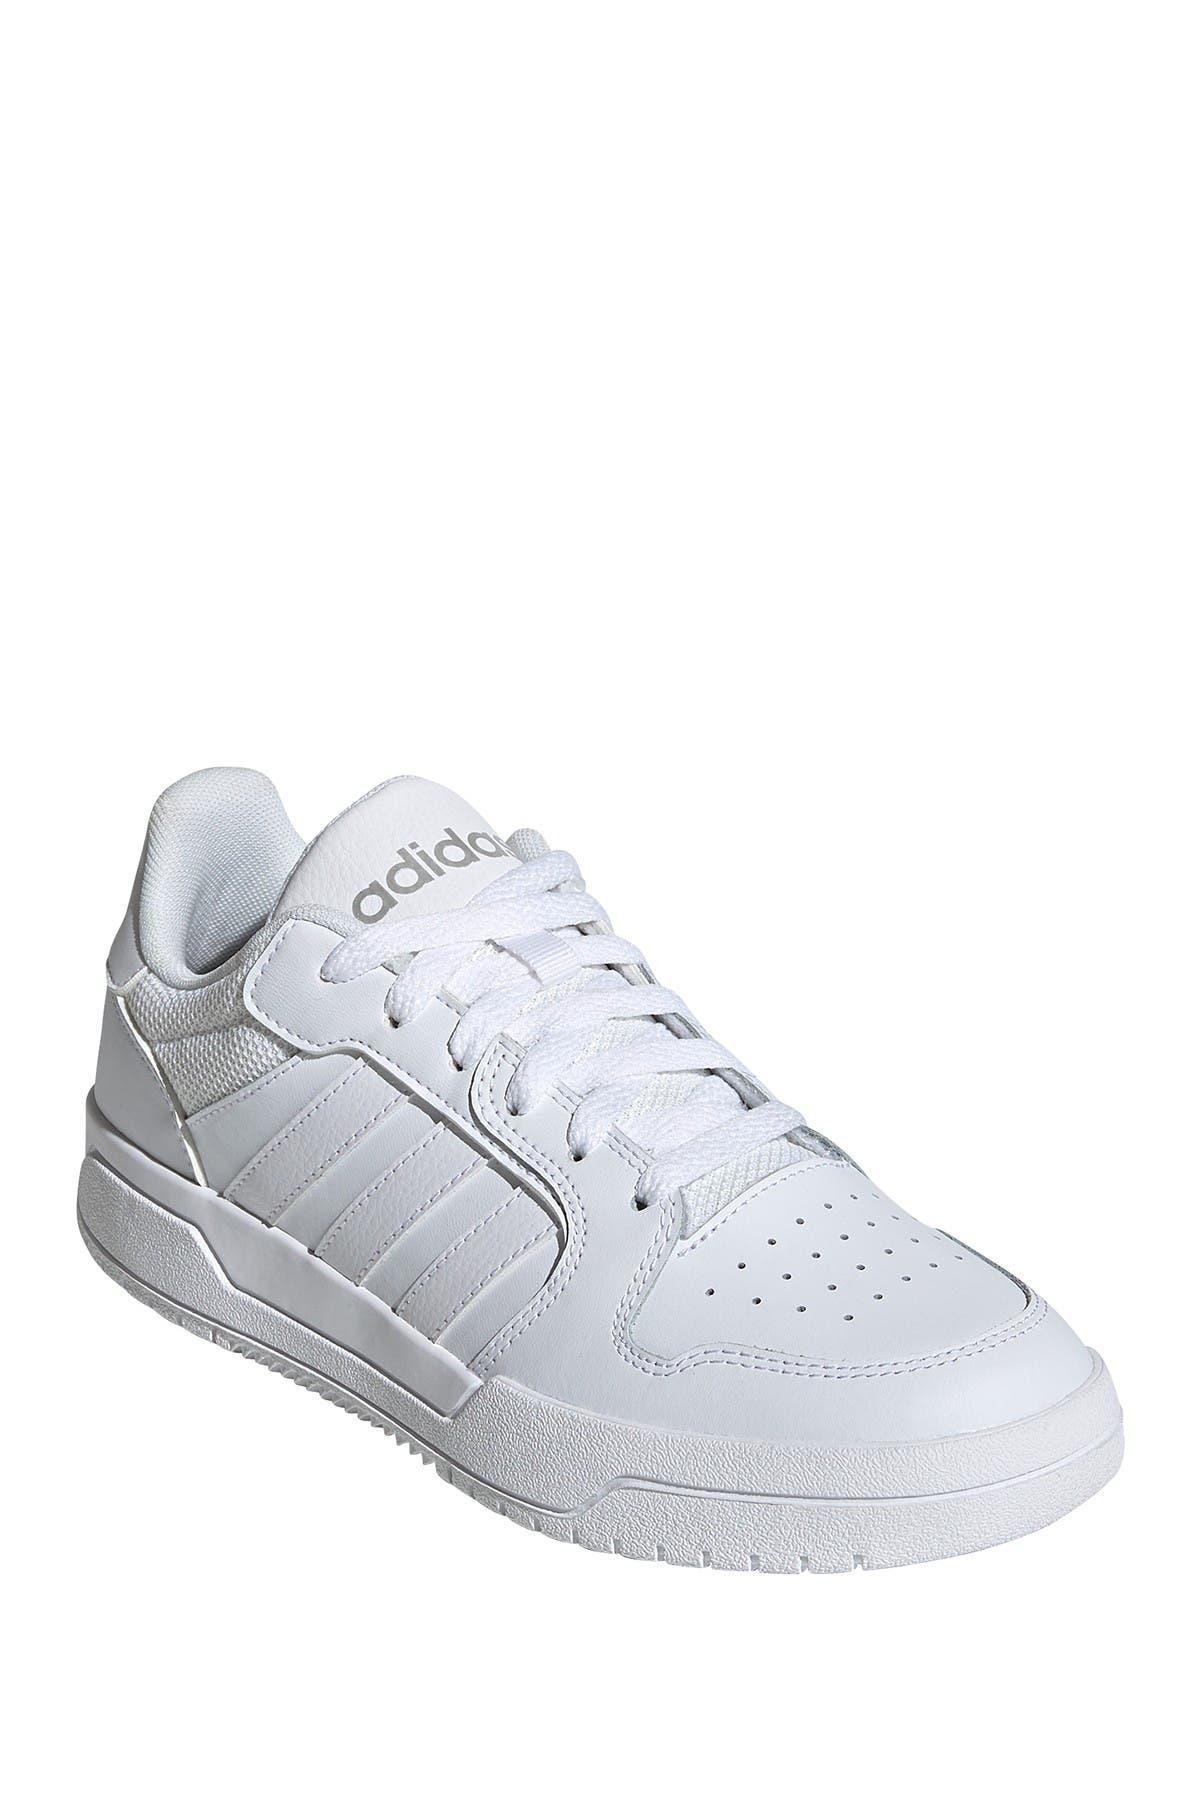 adidas | Entrap Sneaker | Nordstrom Rack